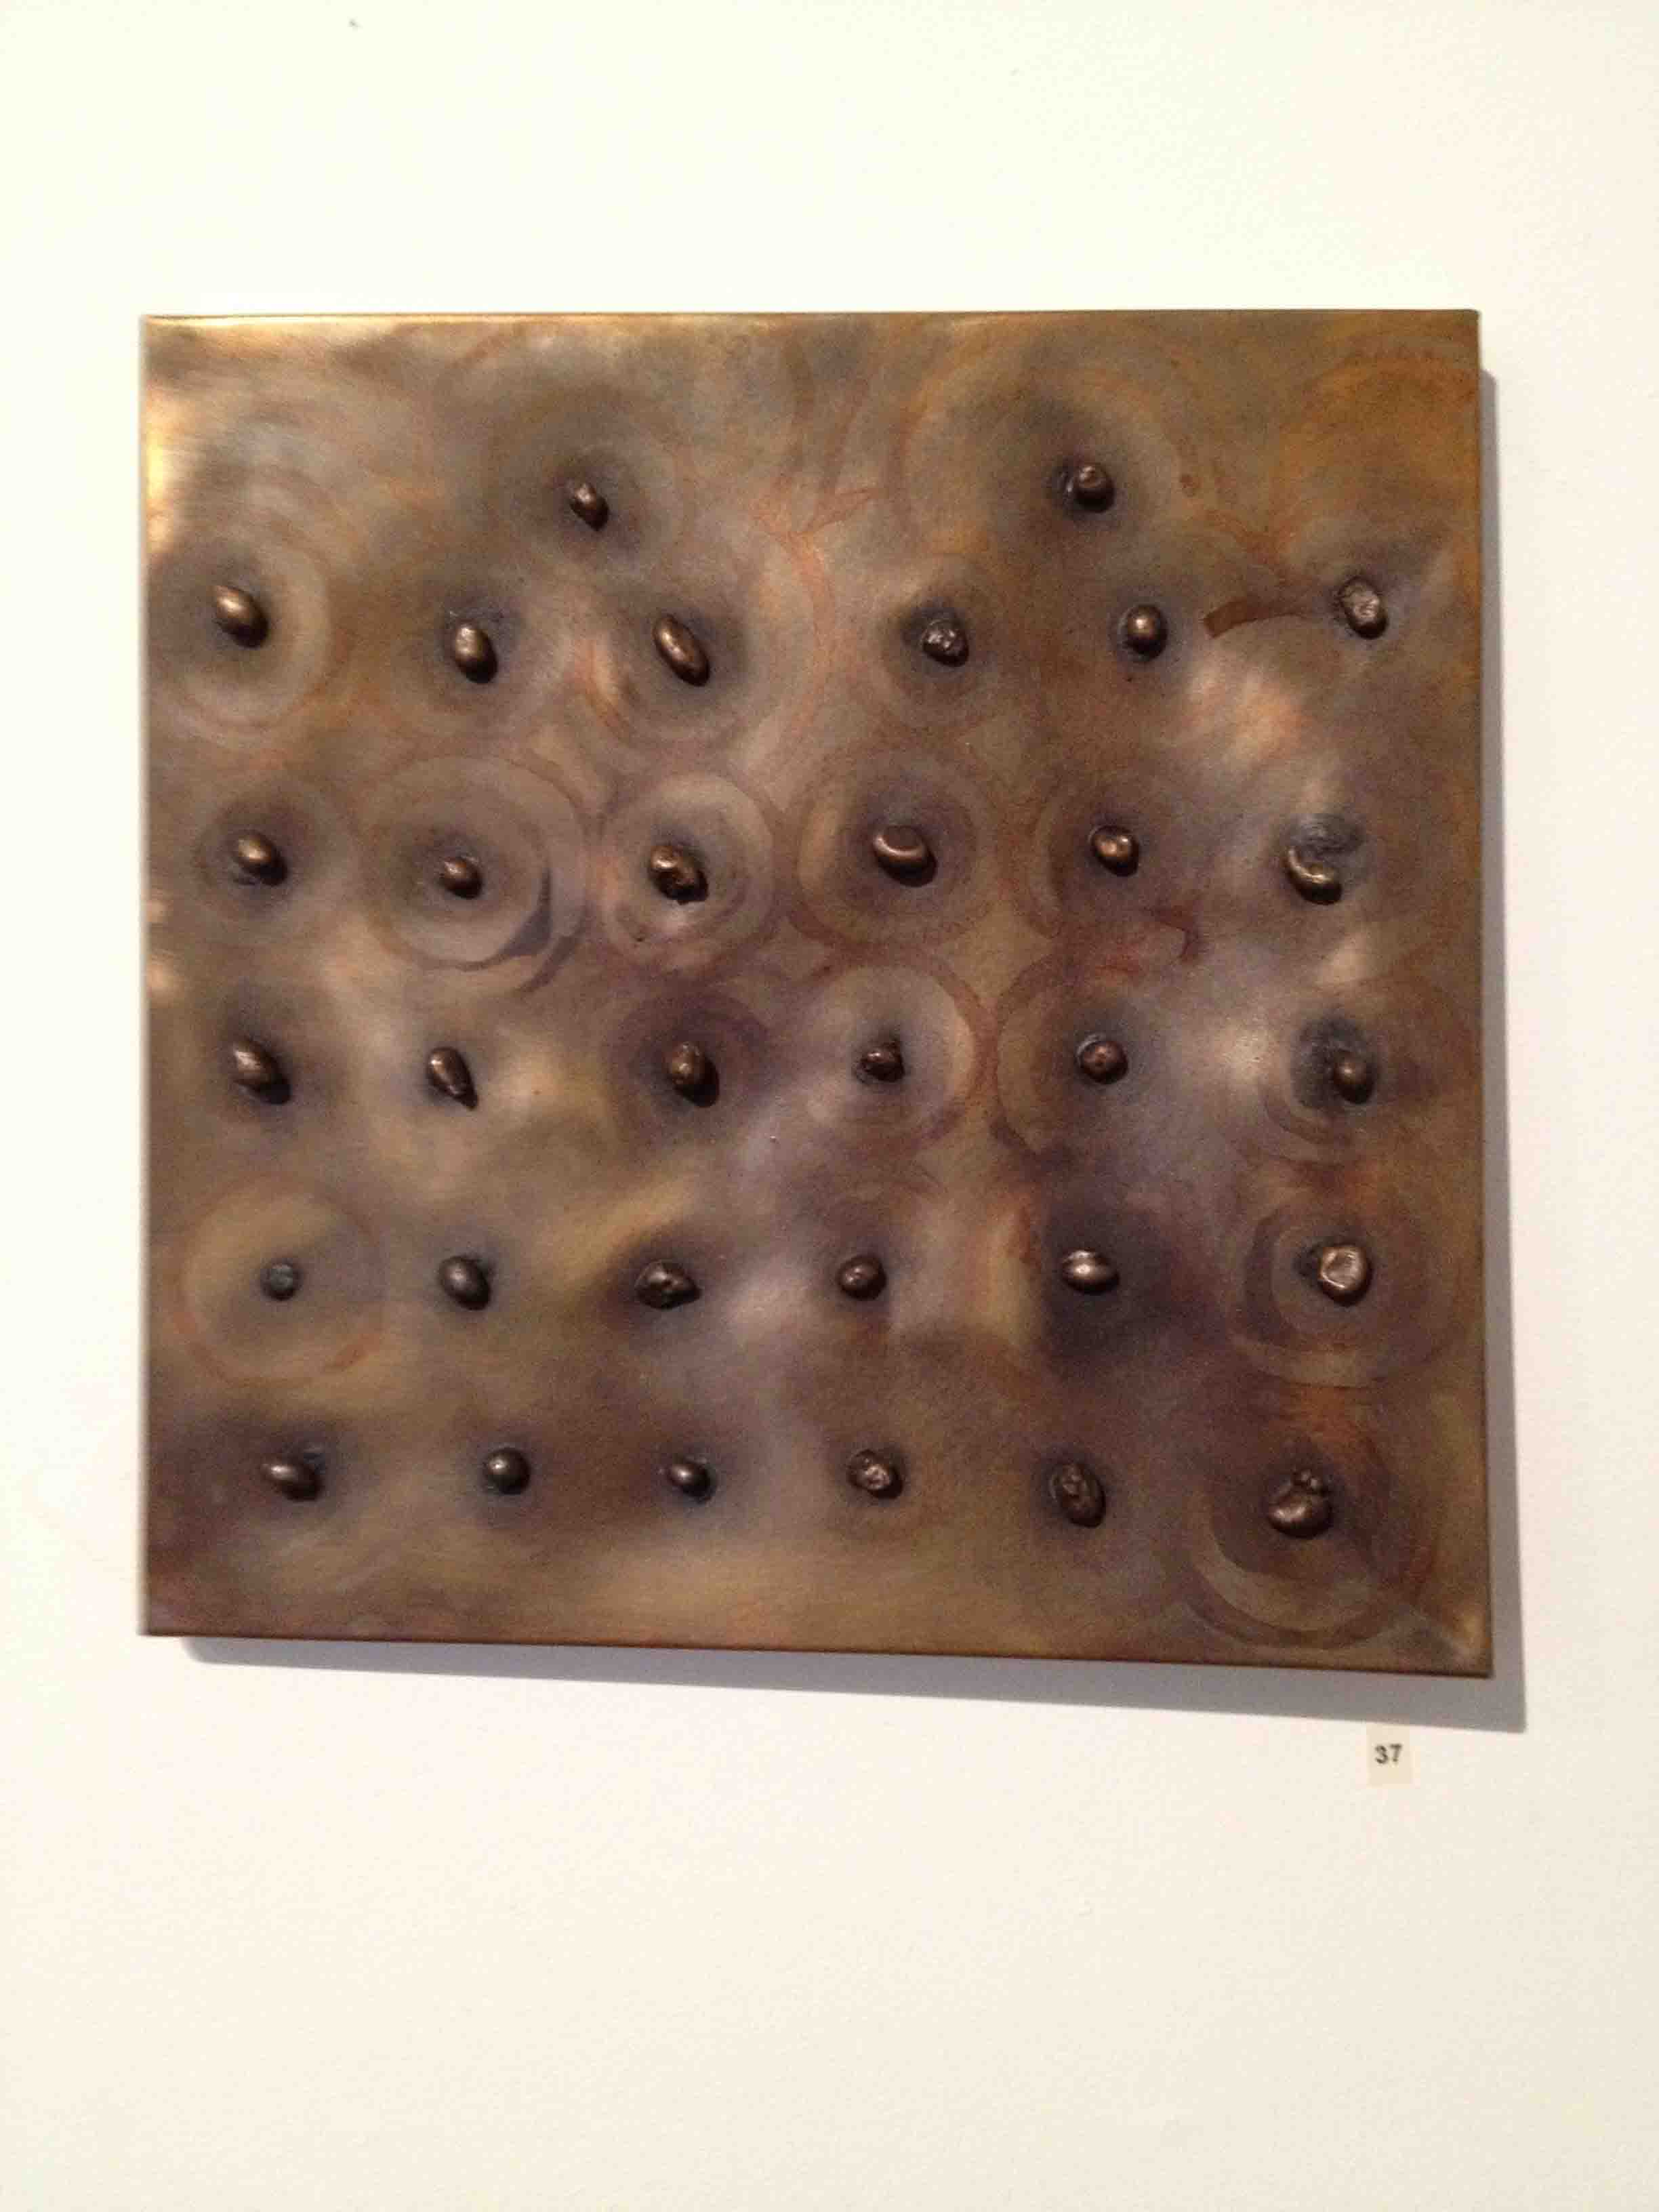 'River stones' 2013 0.2m by 0.2m copper, bronze & patina